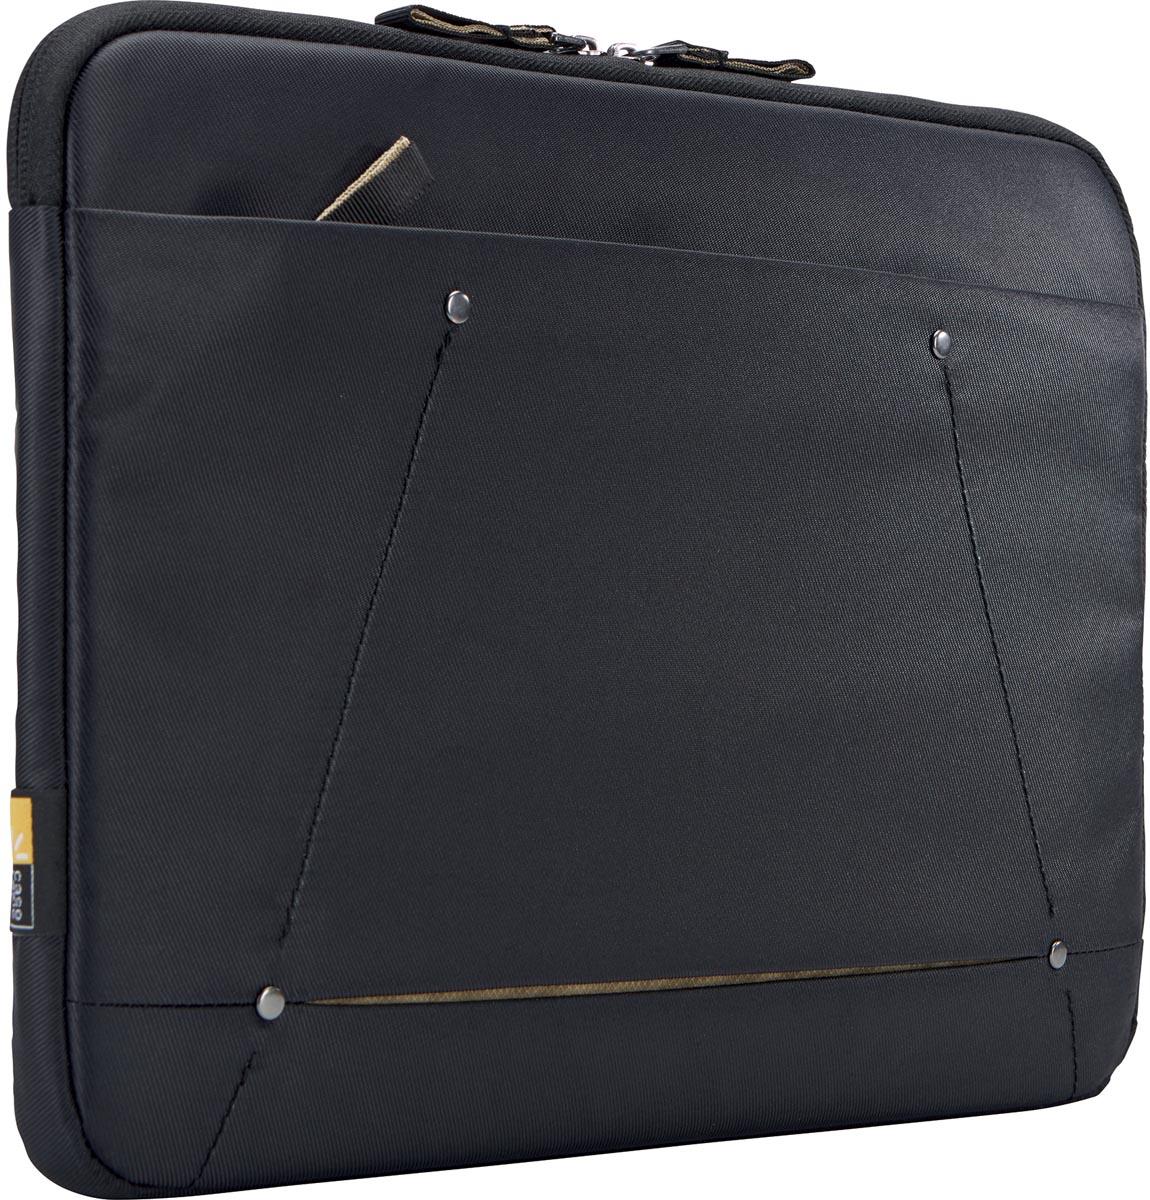 Case Logic Deco hoes voor 14 inch laptops